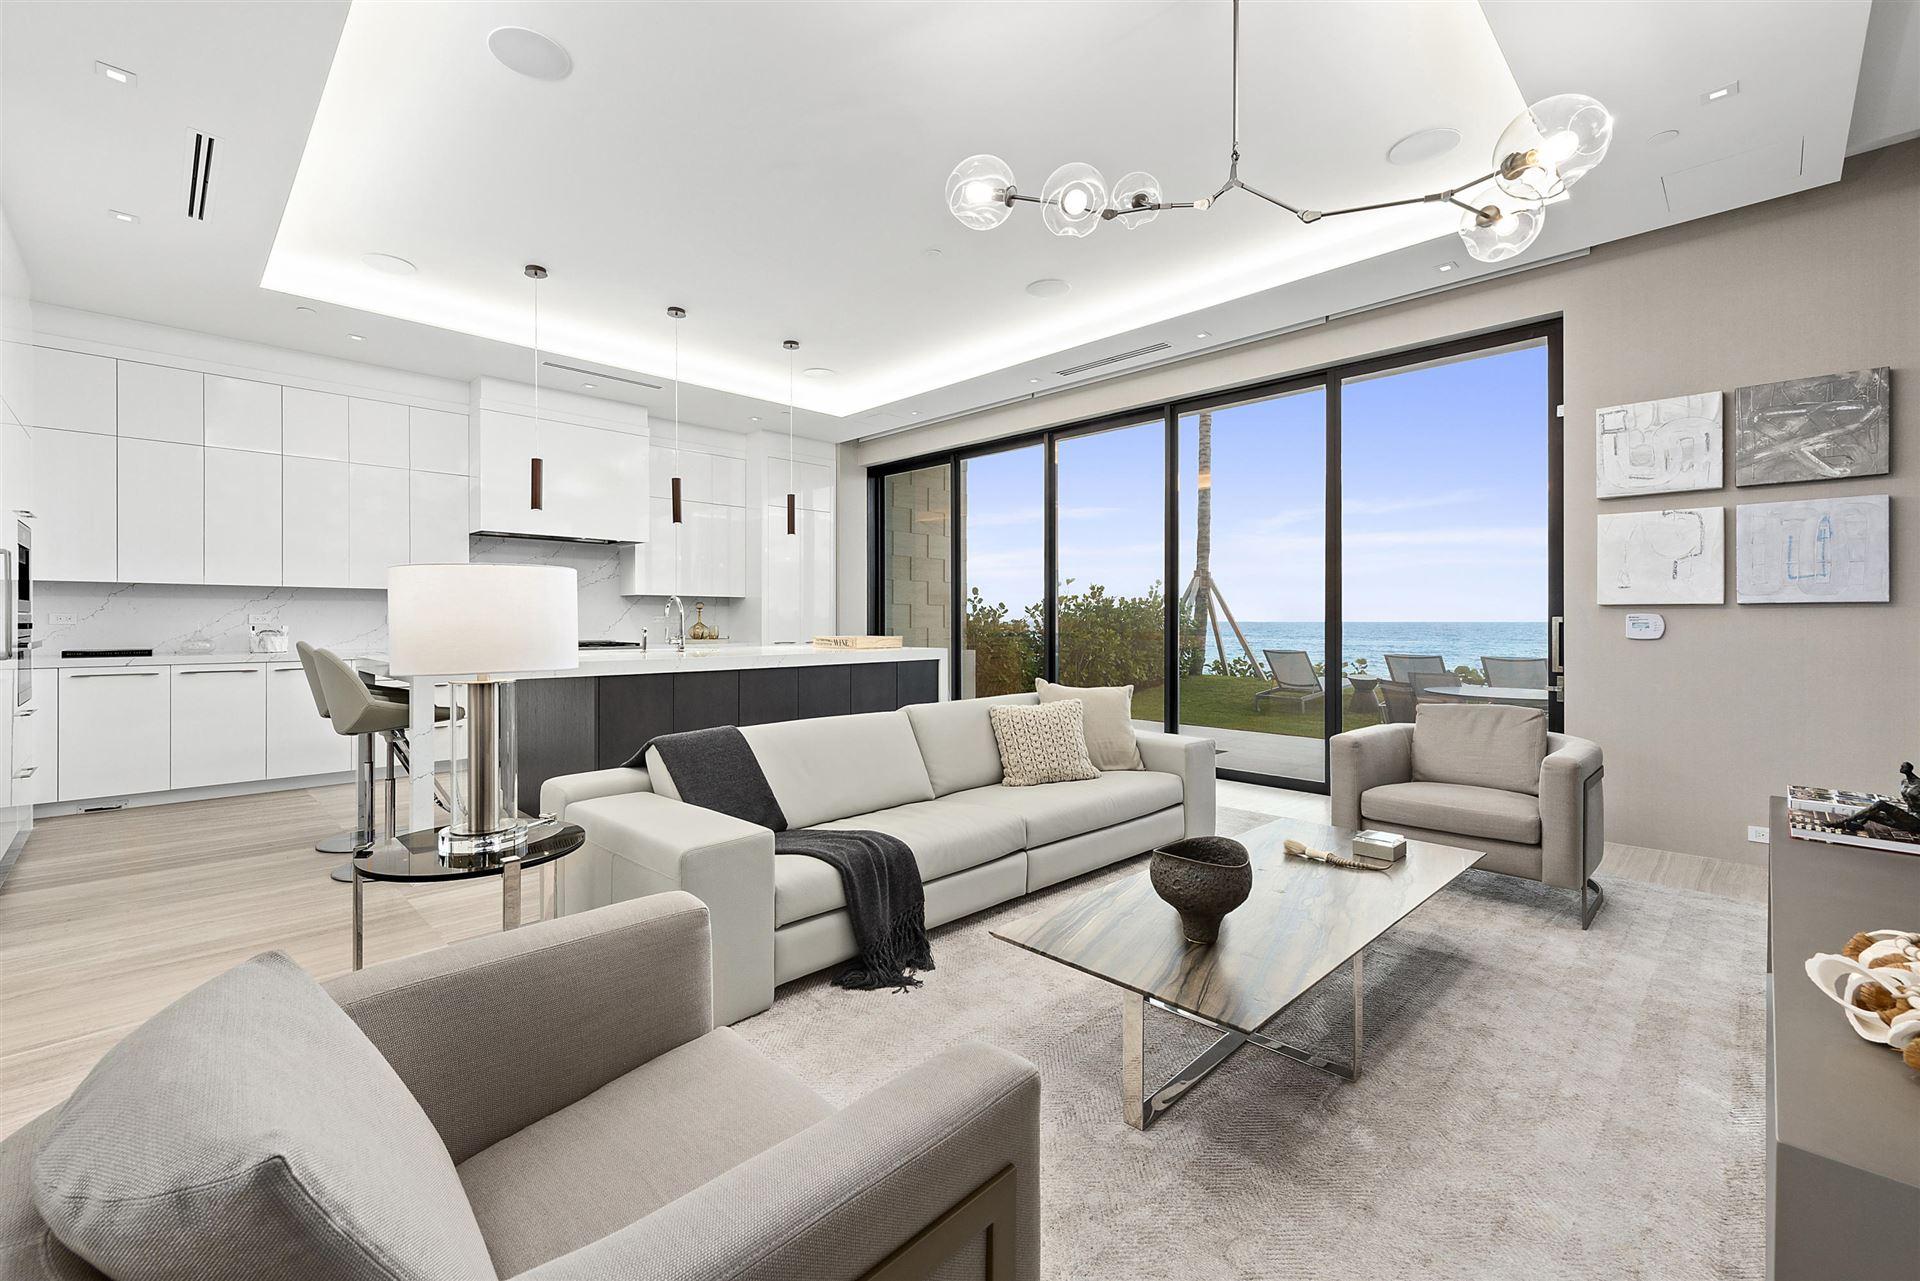 3621 South Ocean Properties For Sale